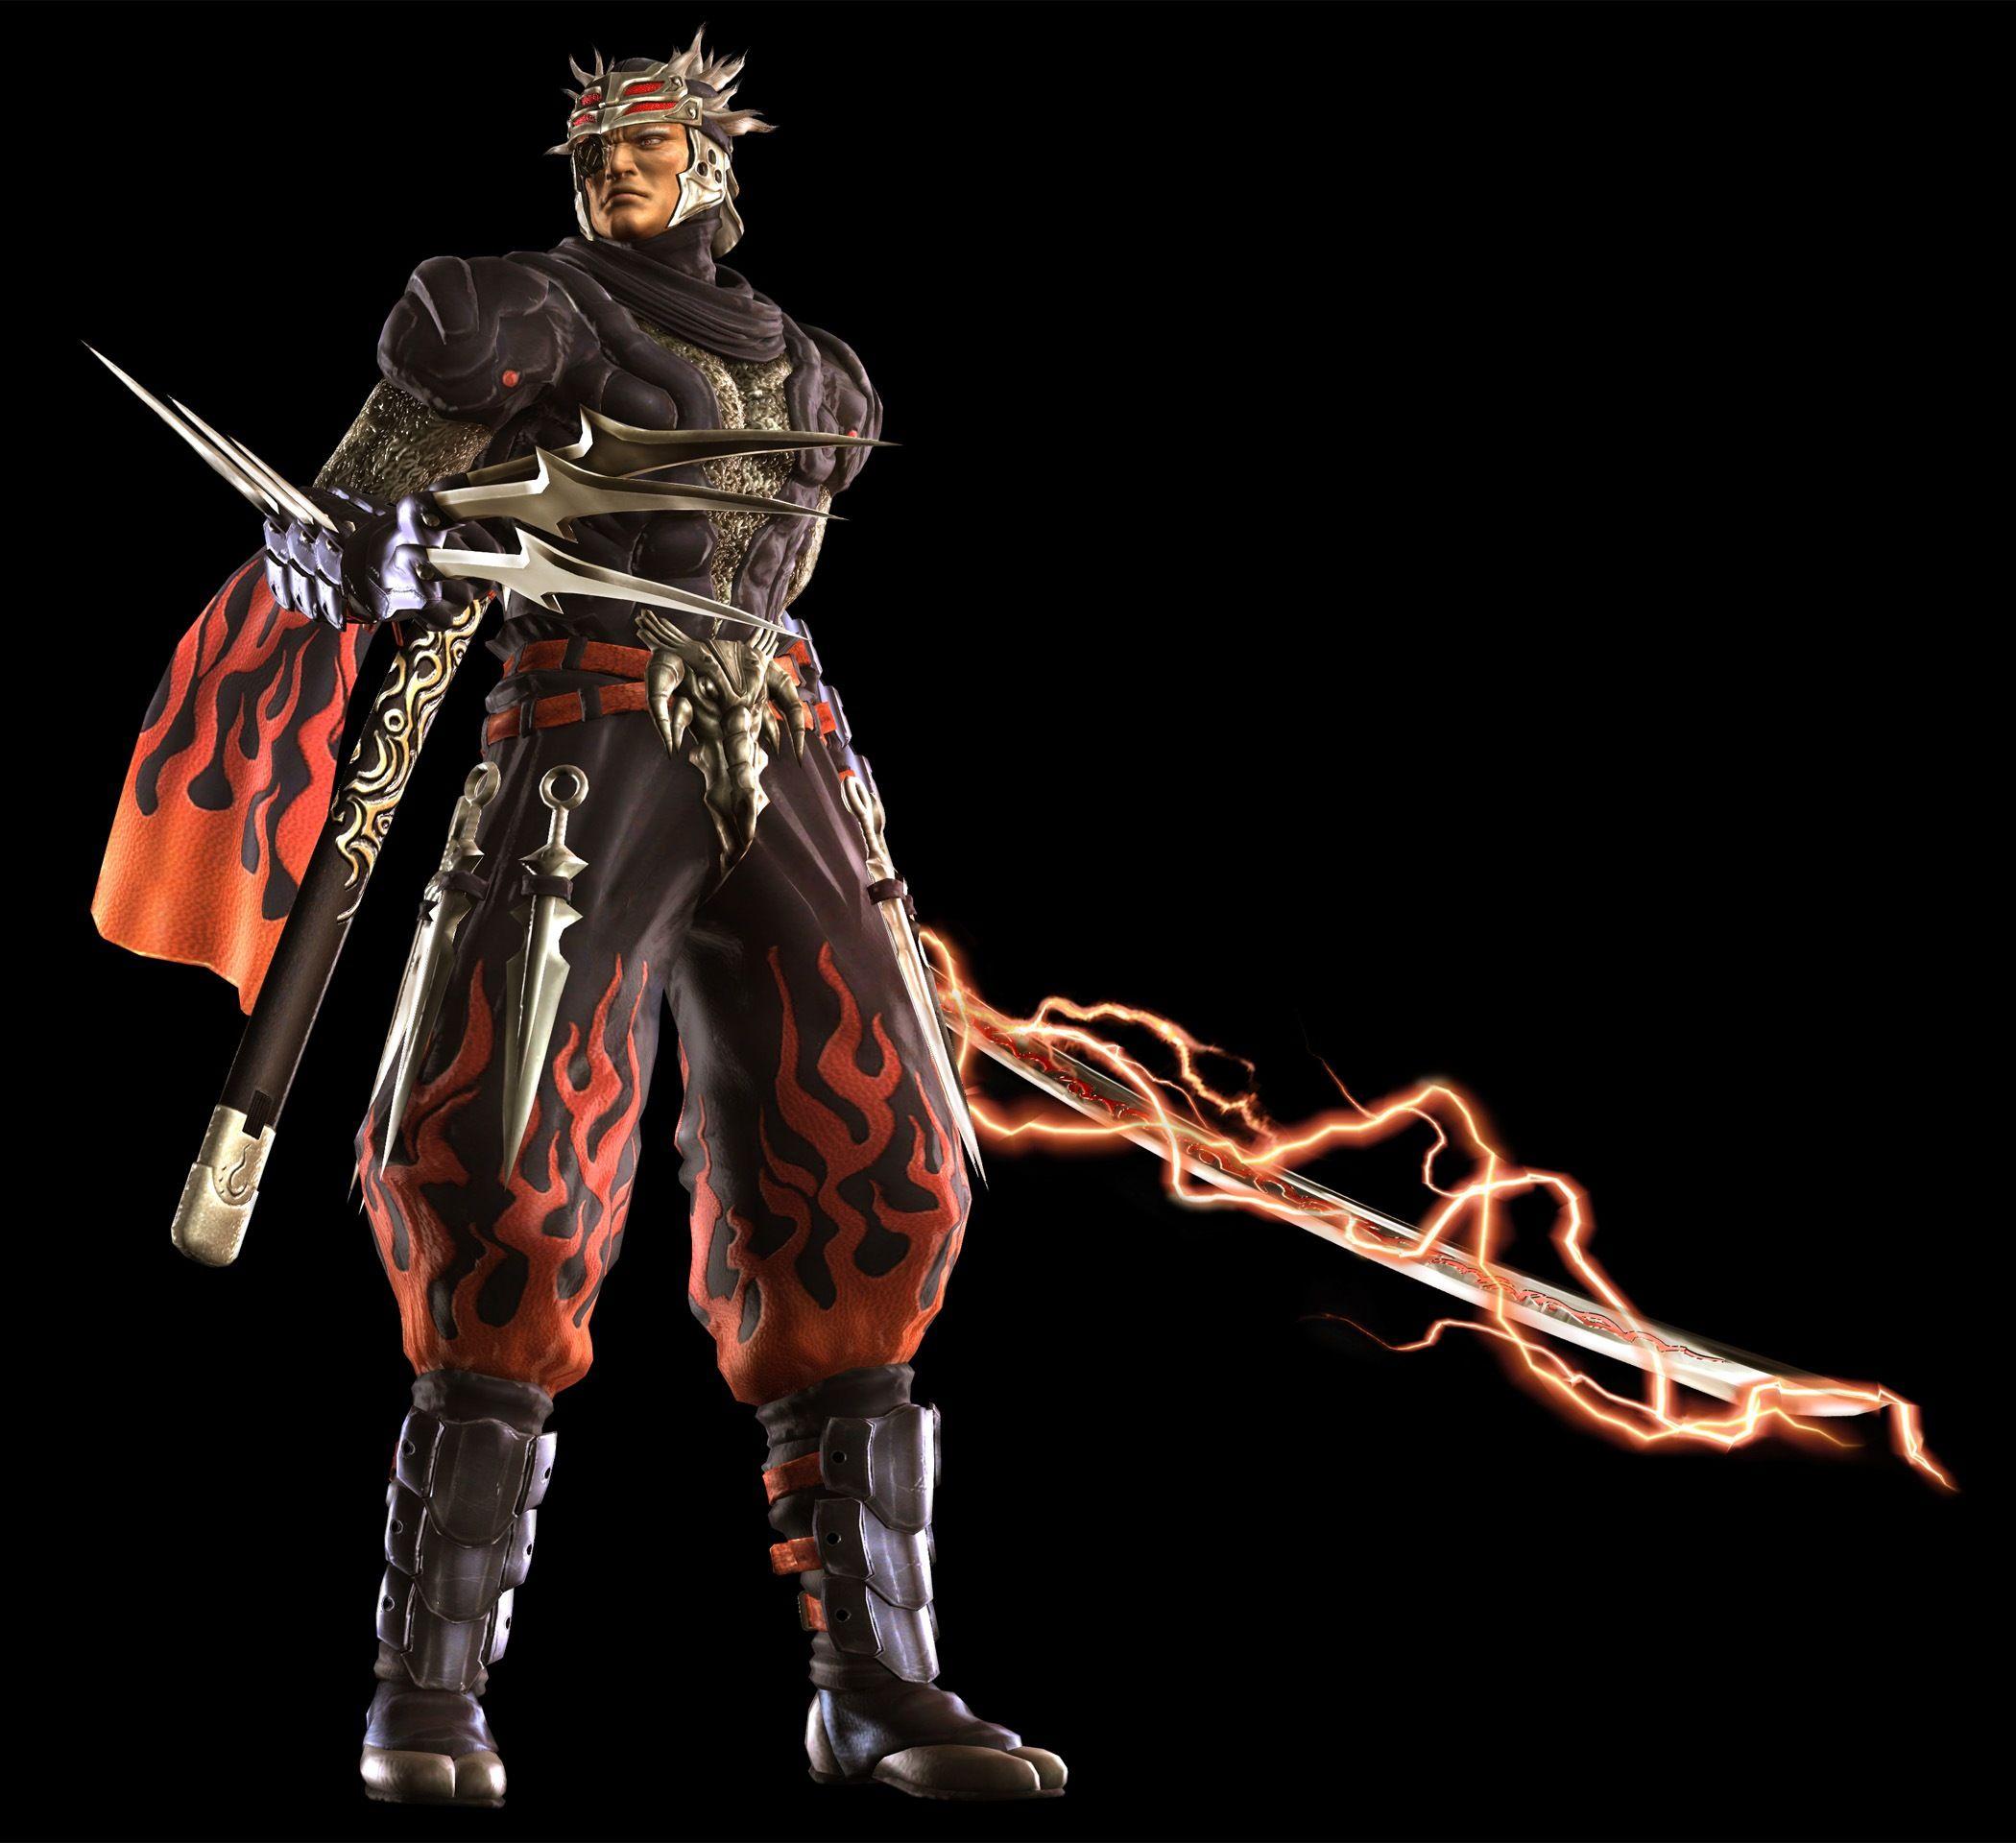 Genshin Ninja Gaiden Ninja Gaiden Ninja Ninja Games